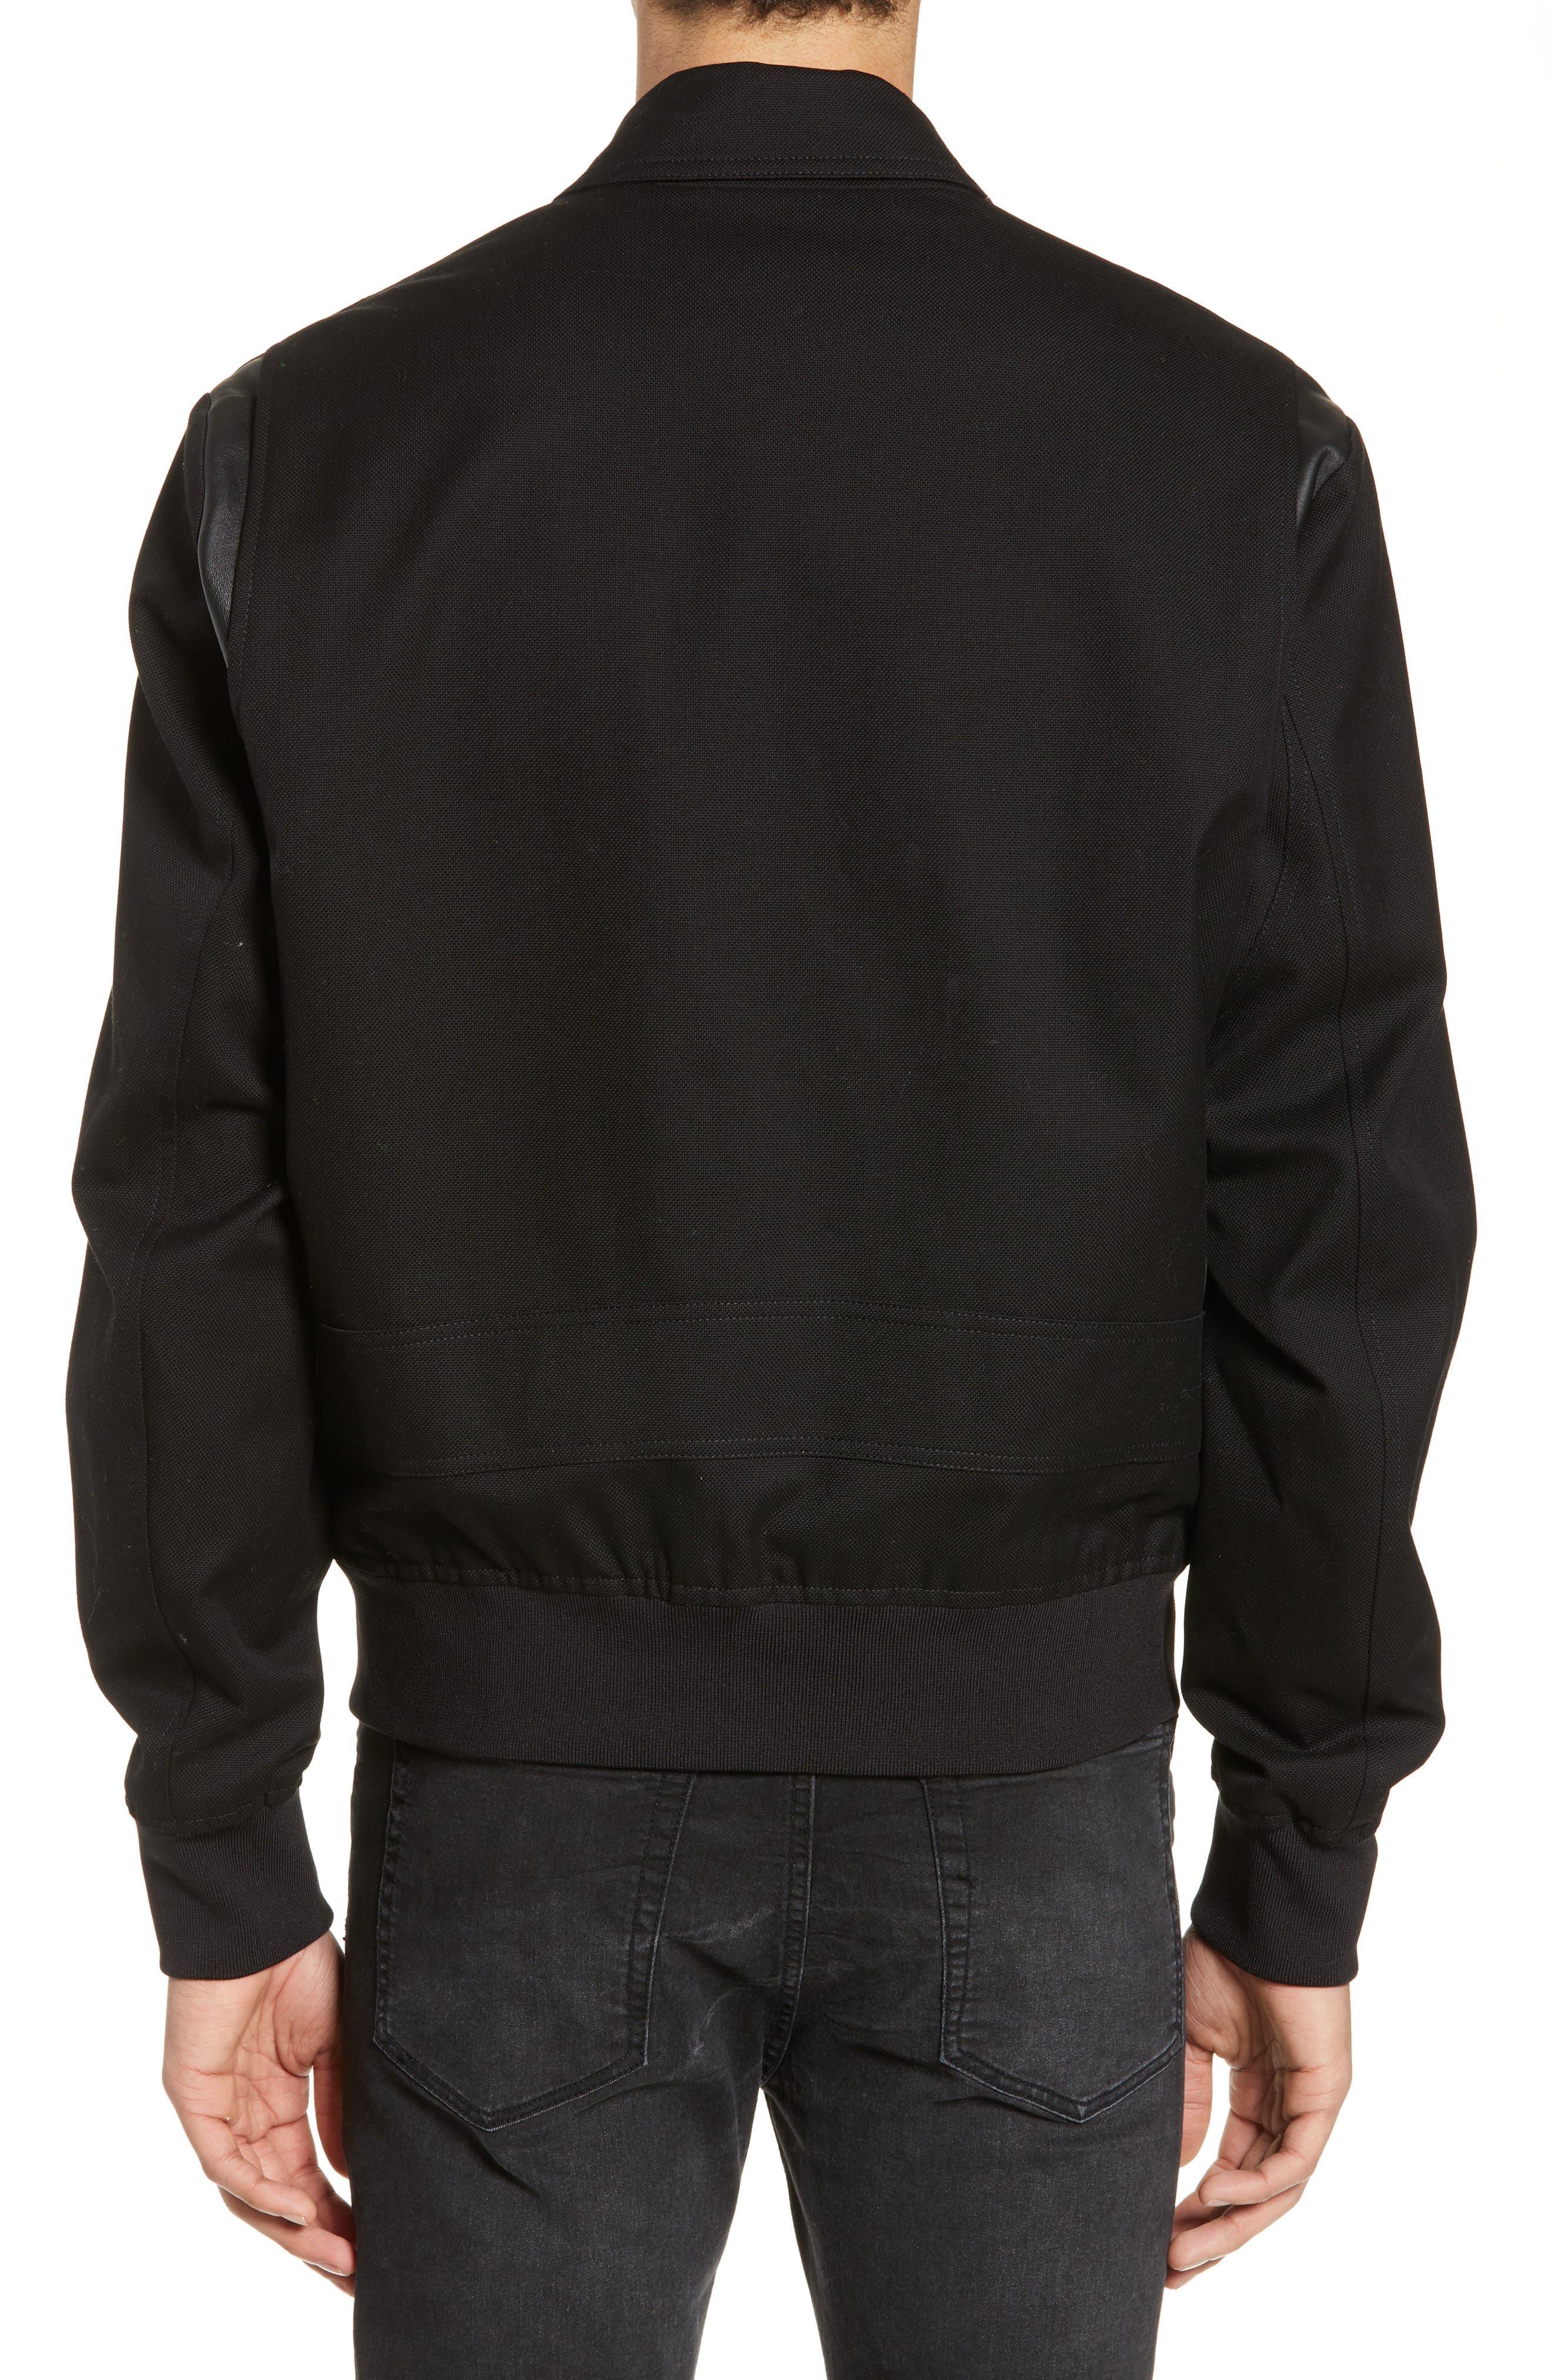 THE KOOPLES, Leather Detail Jacket, Alternate thumbnail 2, color, BLACK